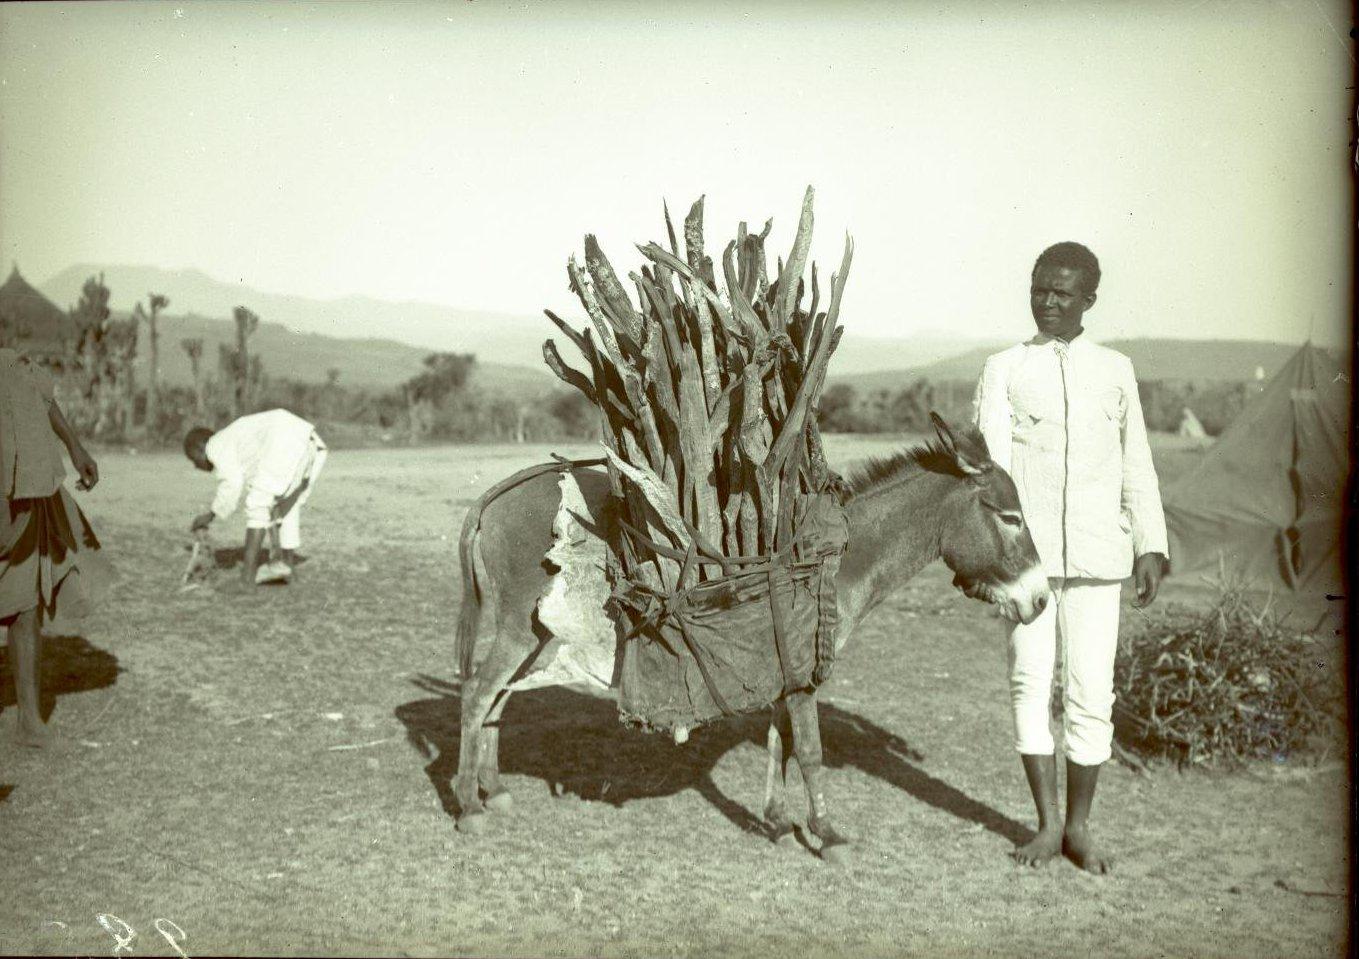 284. Абиссиния, провинция Харар, г. Харар. Гассен  и ослик с дровами